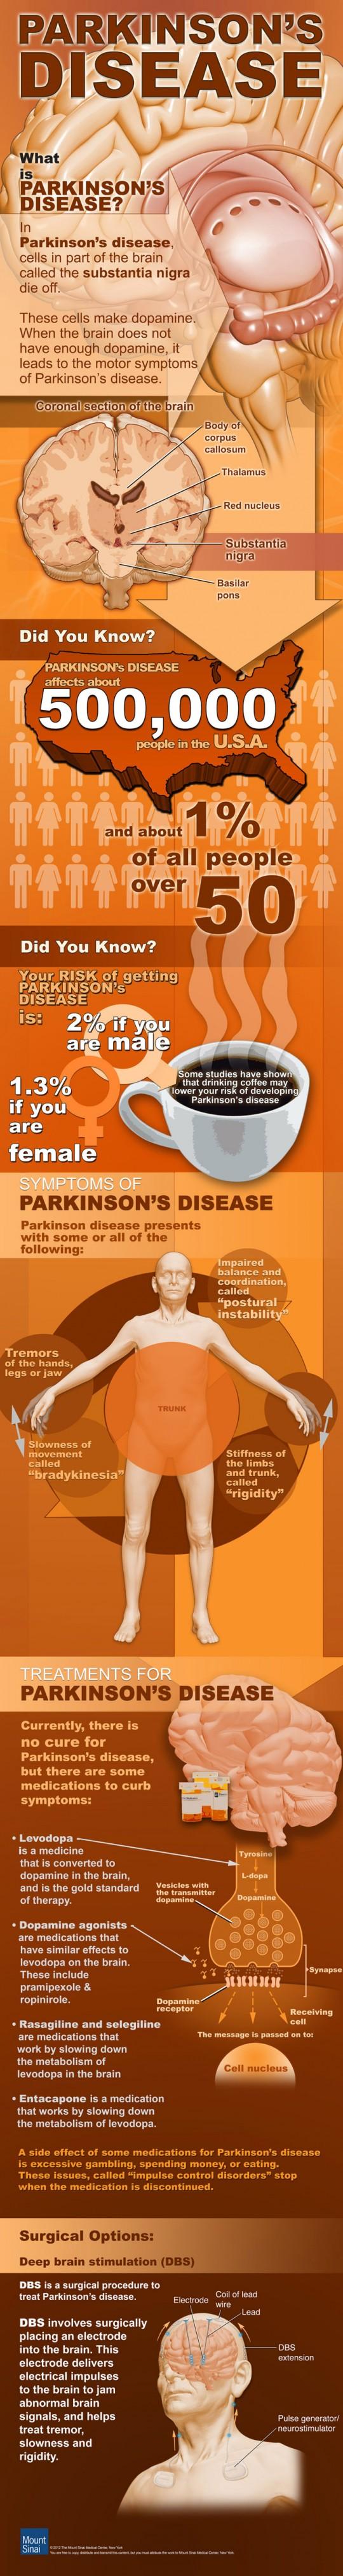 parkinsons-disease_509bb80bc97ad_w540